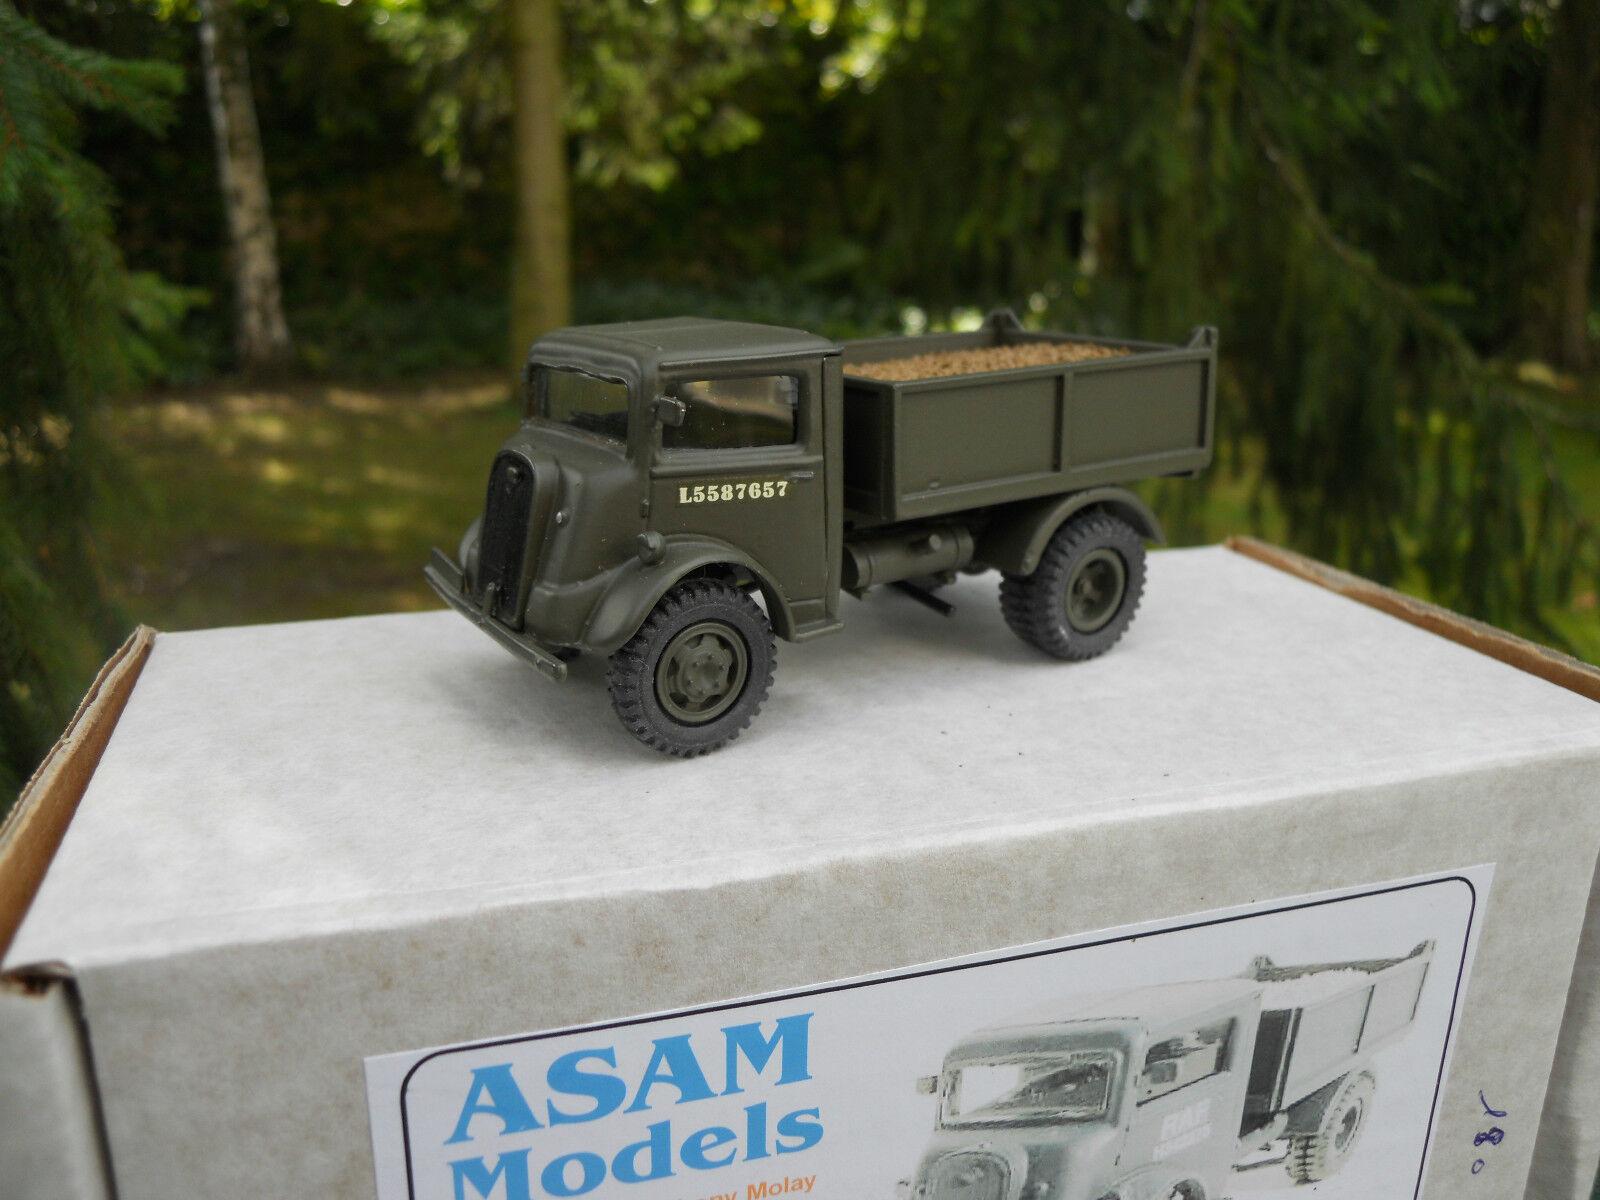 Military vehicle asam models ref ht 311 fordson 76v 4x2 tipper mint in box